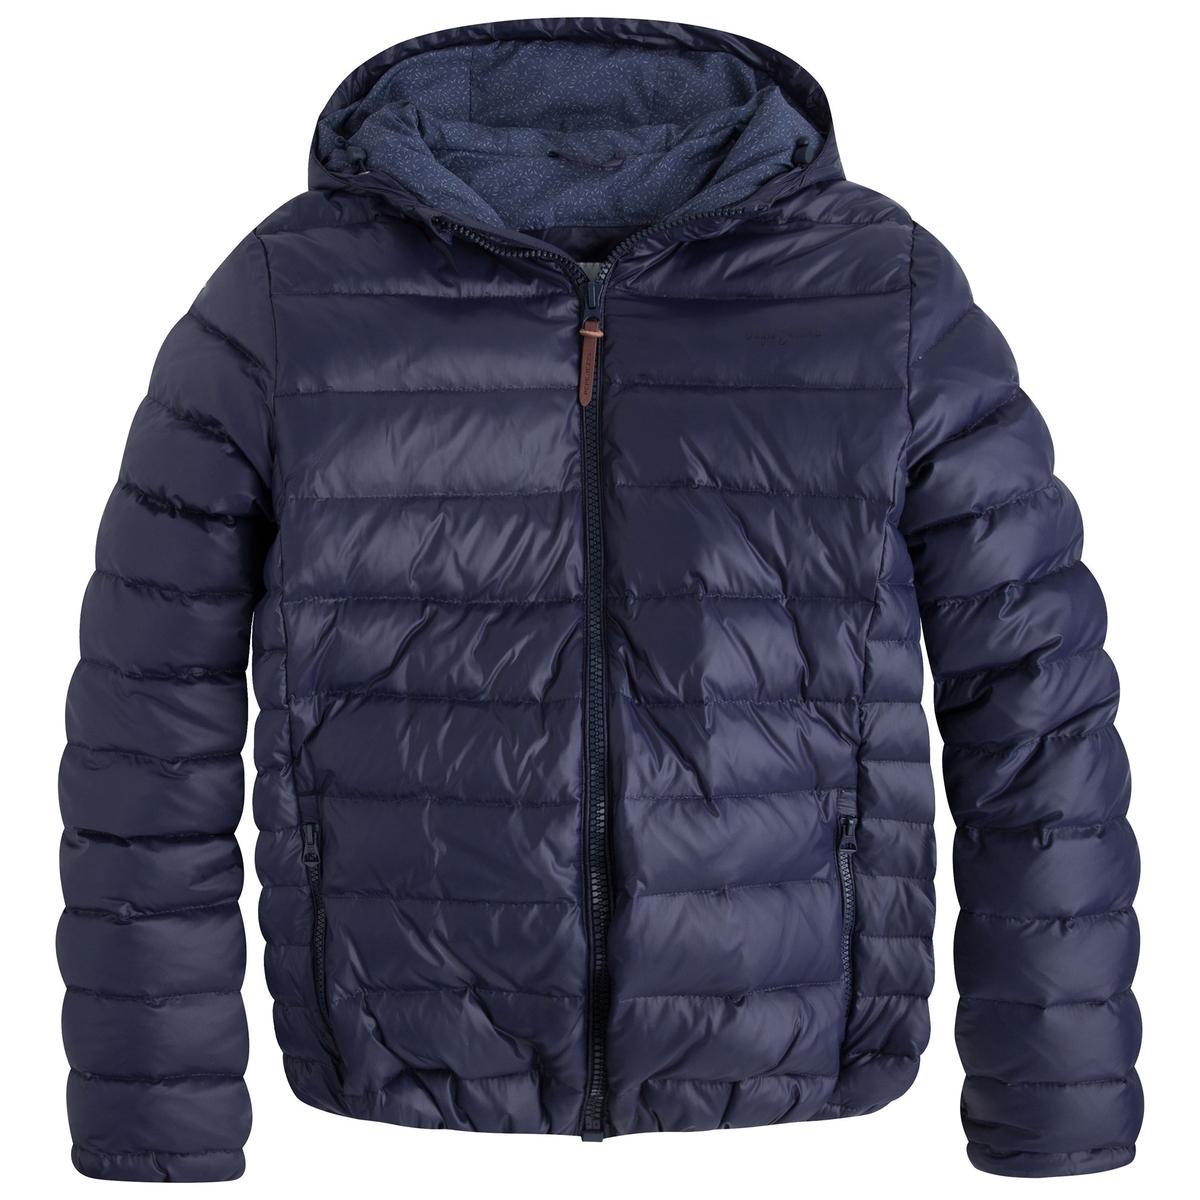 Стеганая куртка с капюшоном PEPE JEANSСостав и описание:Материал: 100% полиамидаМарка: PEPE JEANS<br><br>Цвет: синий